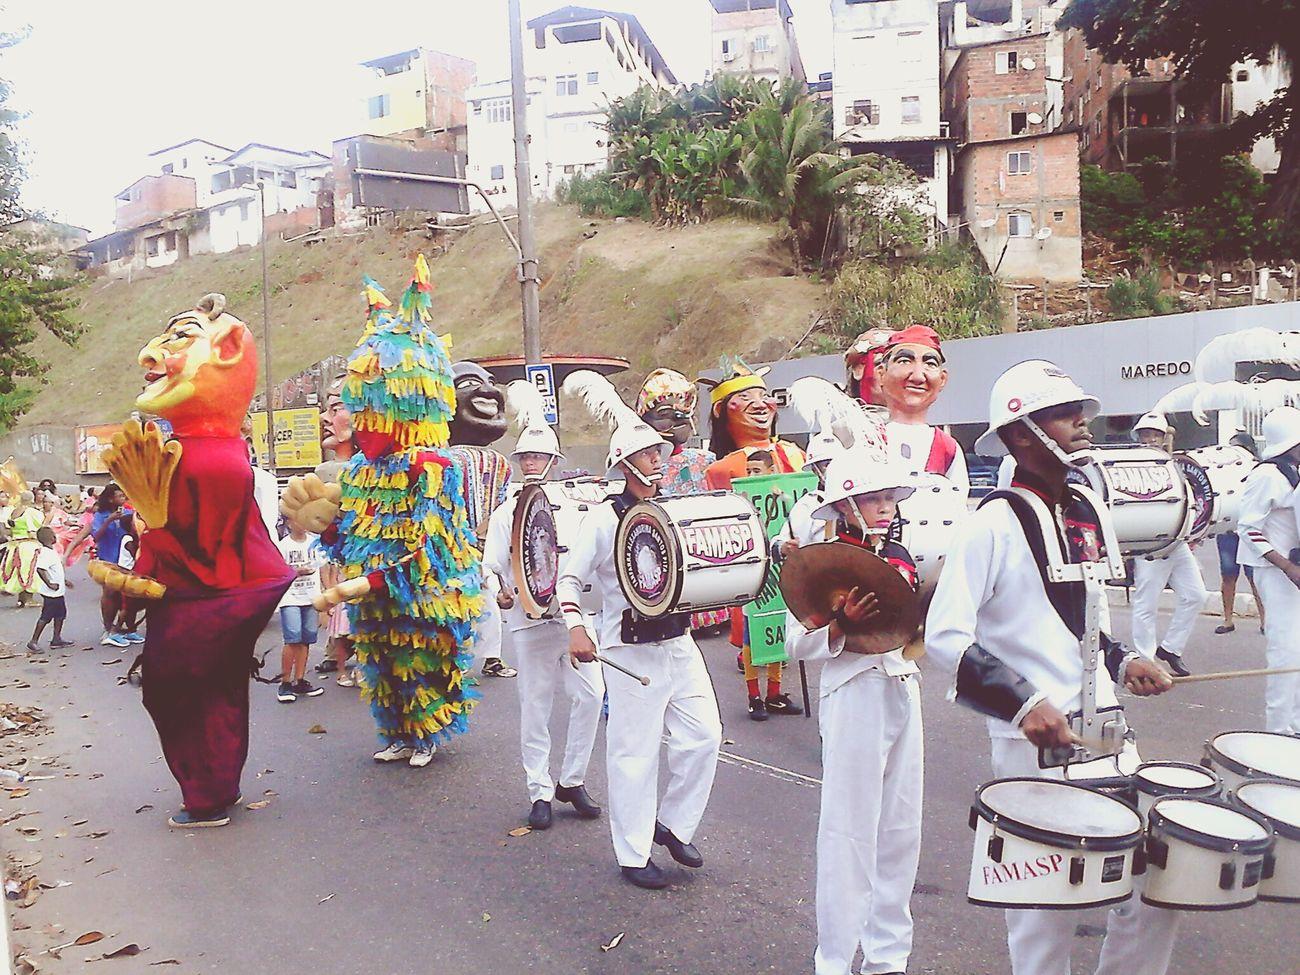 Colors Of Carnival Raízes Da Bahia Brazil Bahia Salvador Dique Do Tororó Brasil